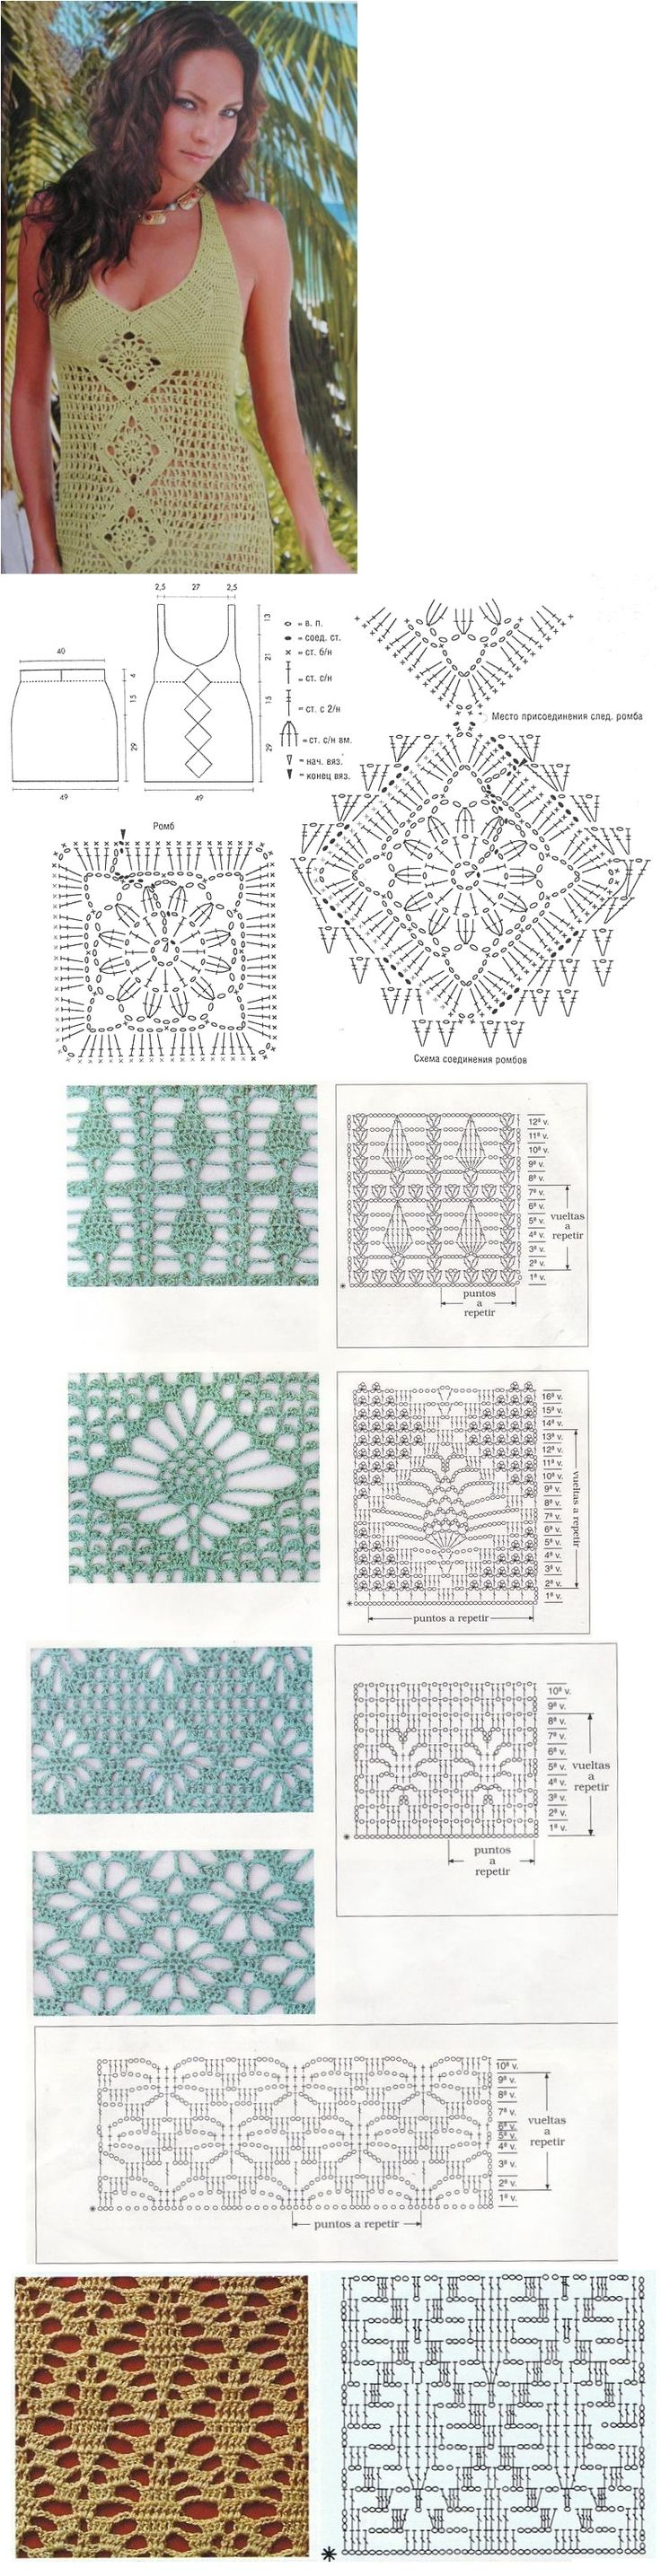 I really like this crochet motif! http://www.liveinternet.ru/users/4553972/post217679709/